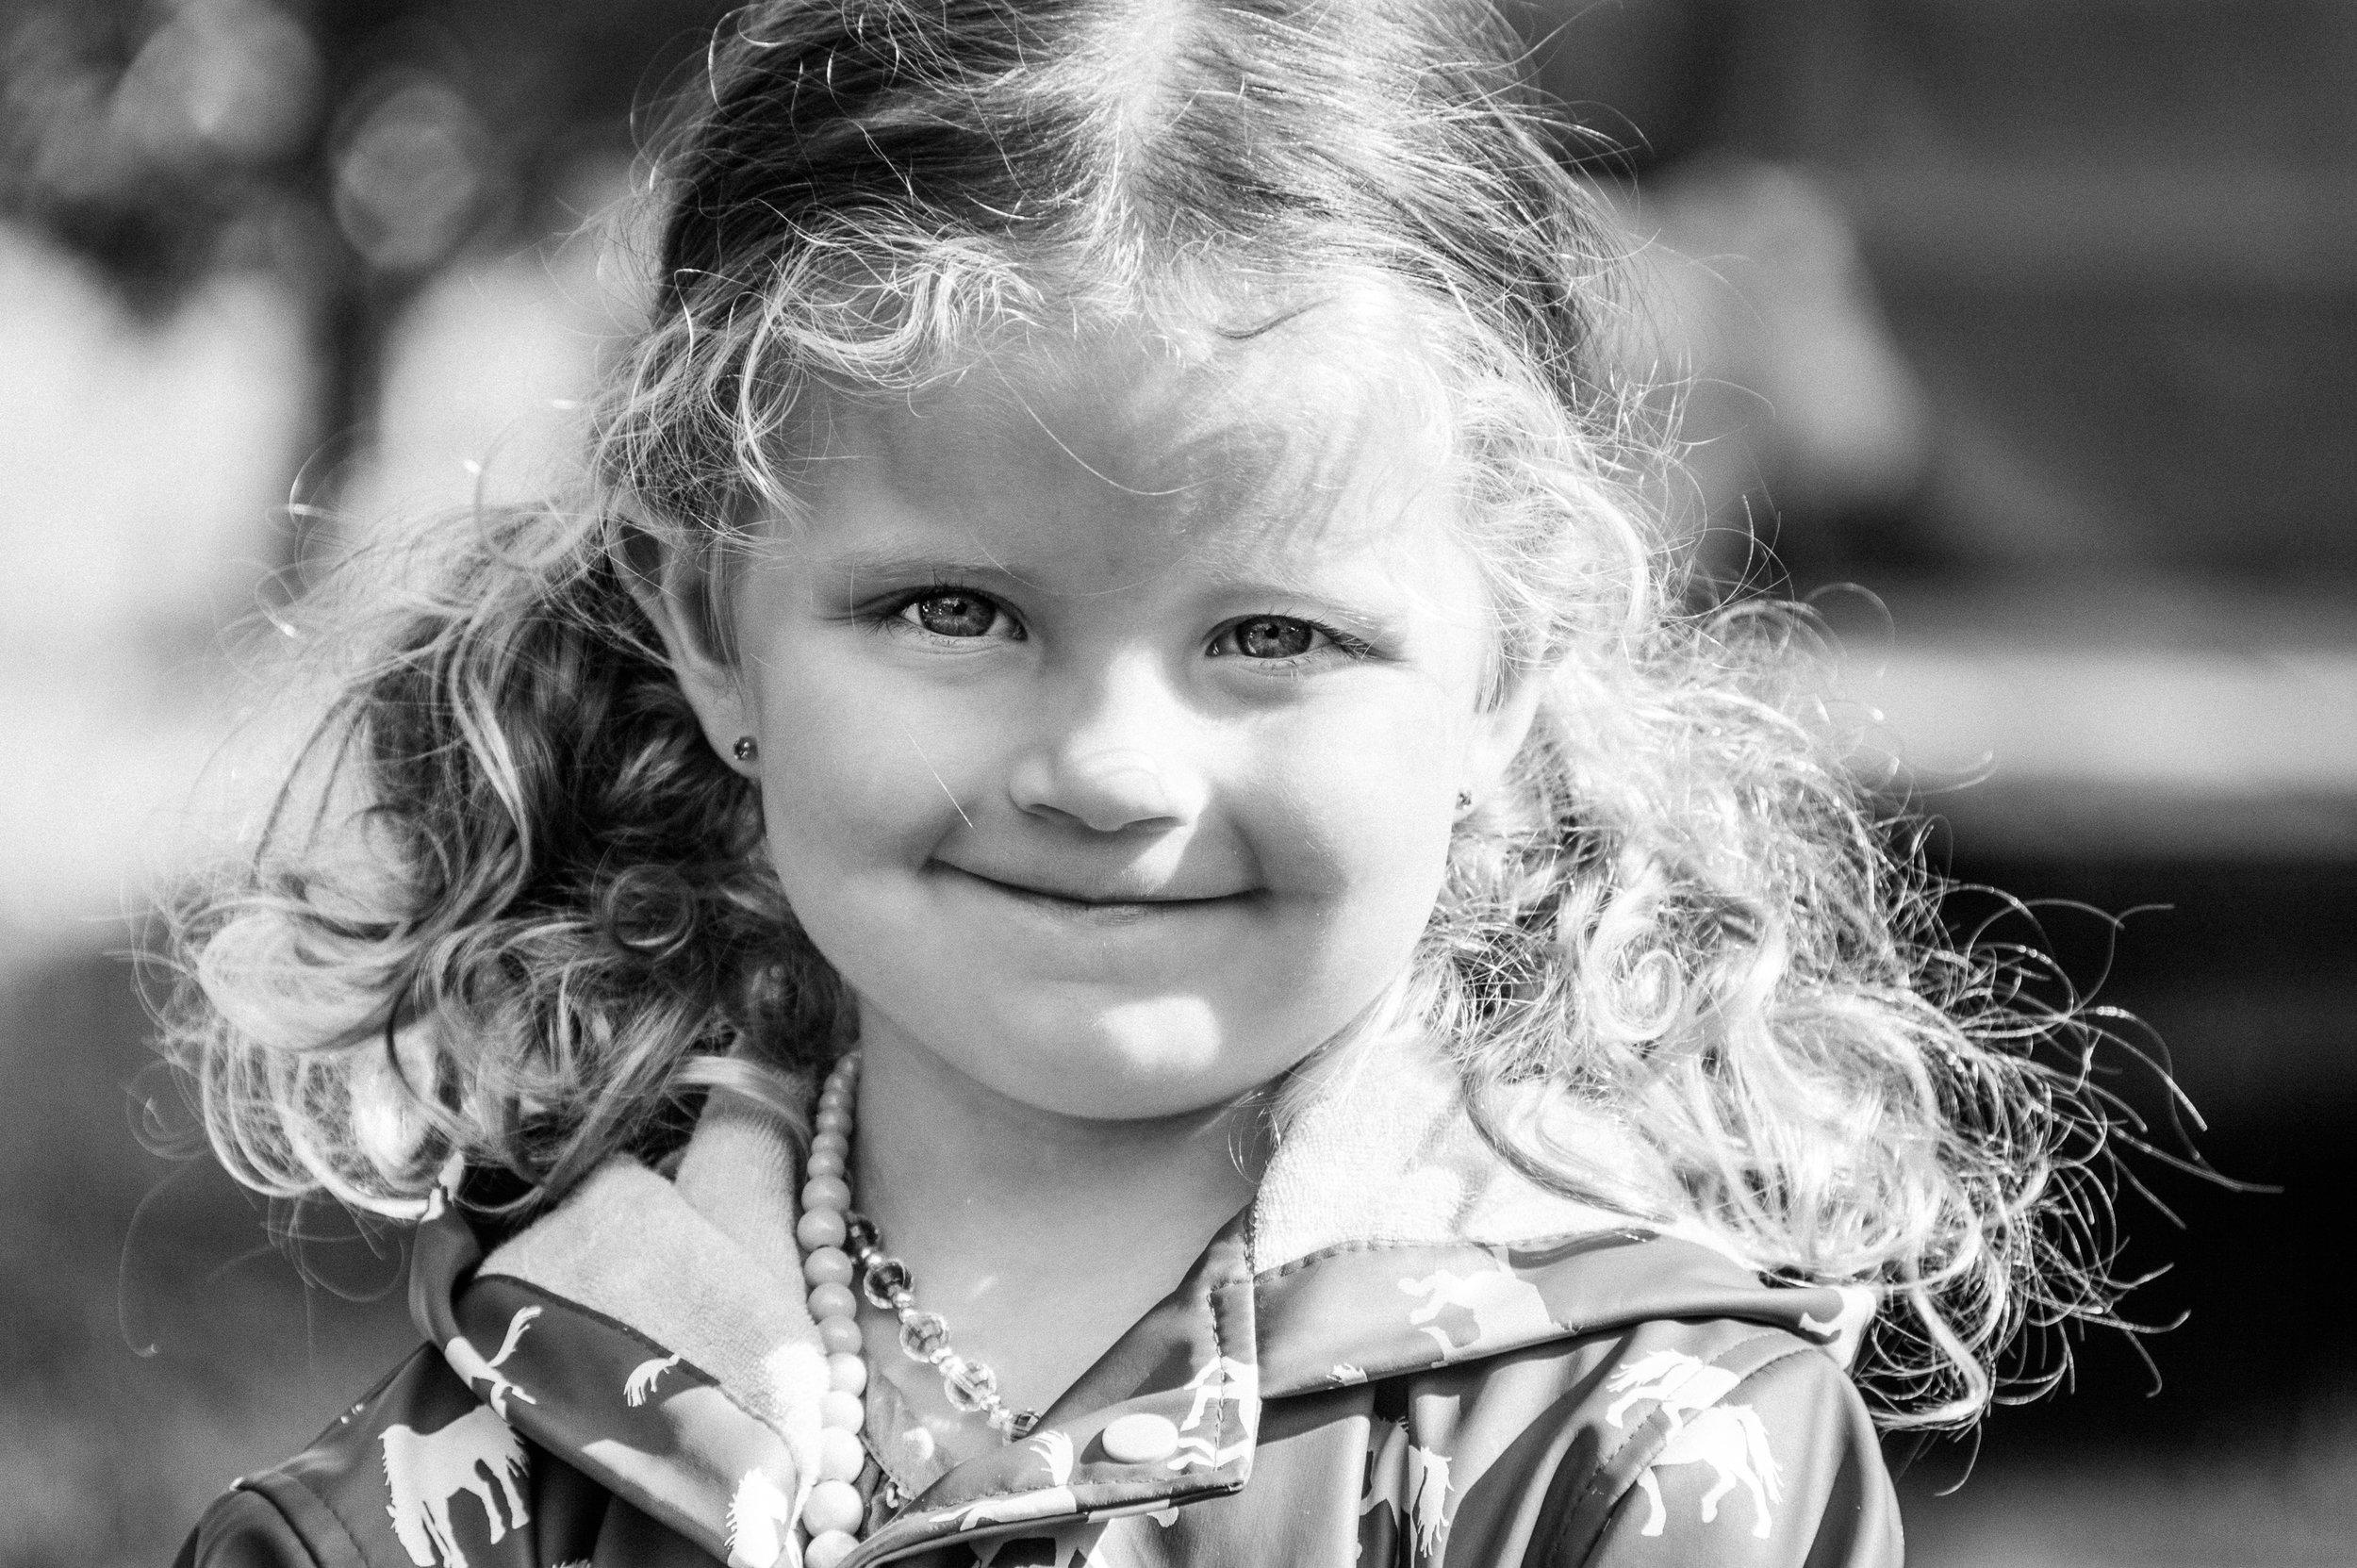 documentary school photography viara mileva kingston toronto ottawa-164827vm.jpg